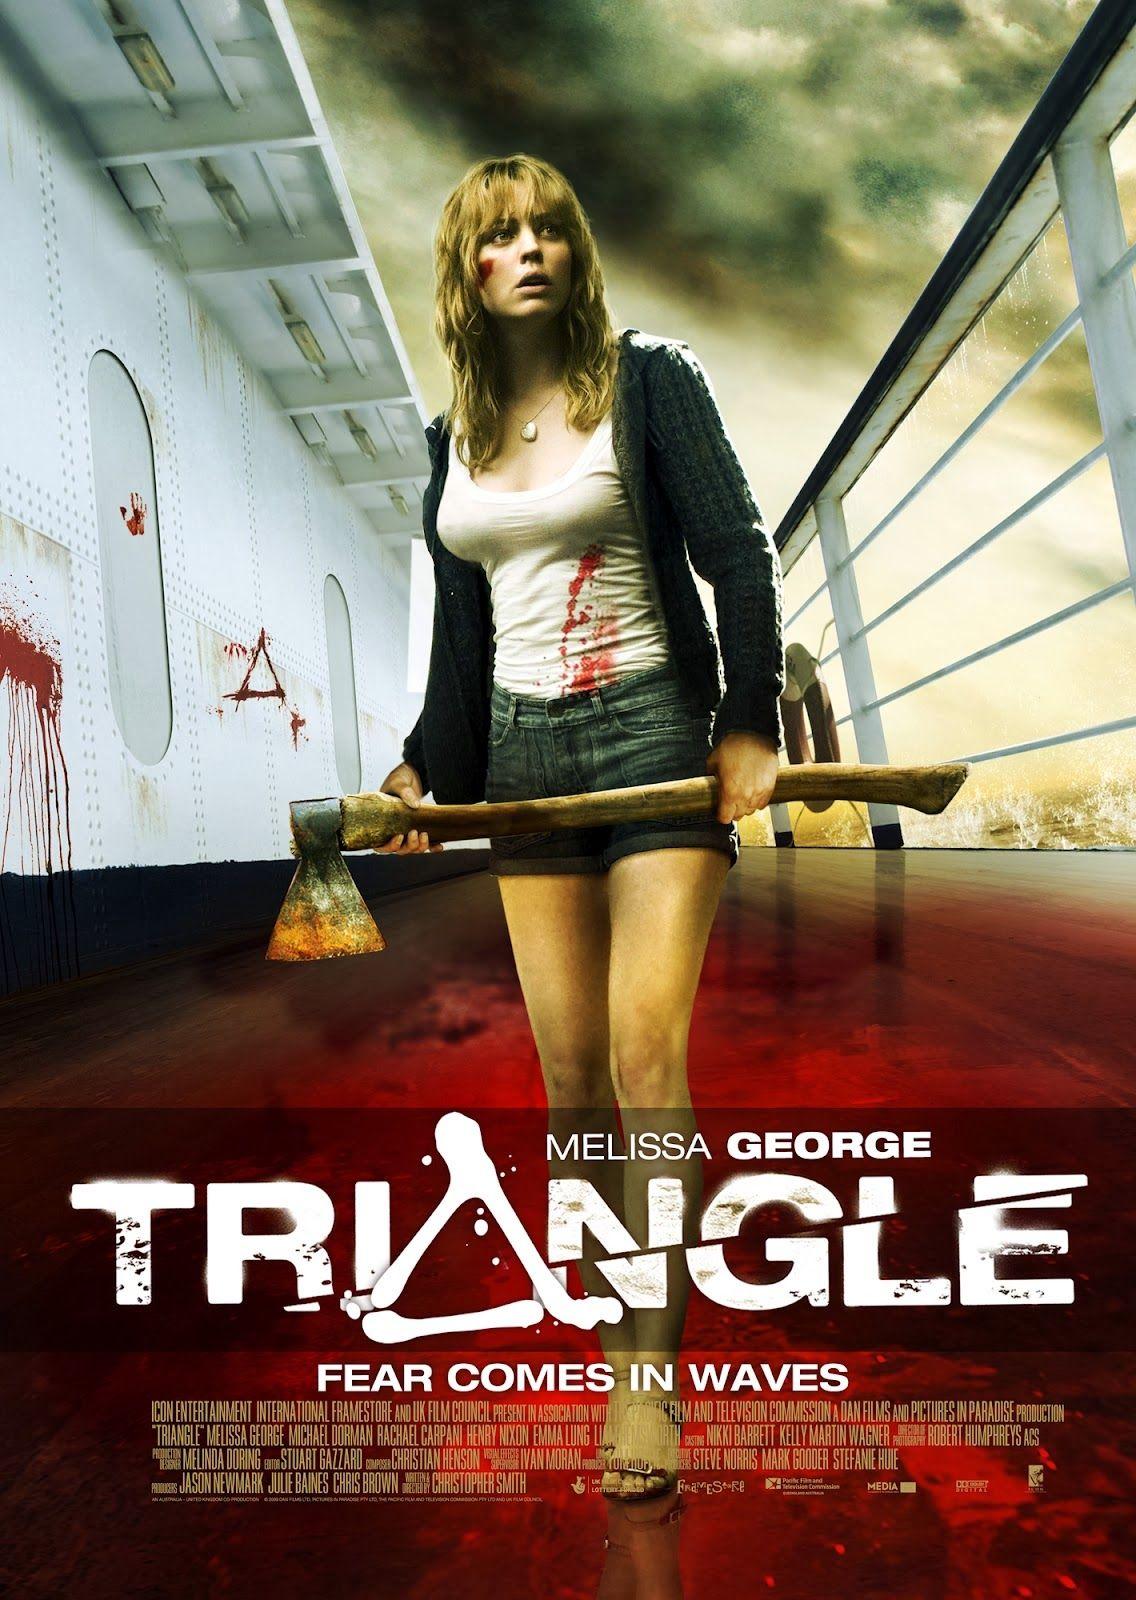 triangle 2009 movie record pinterest triangle 2009. Black Bedroom Furniture Sets. Home Design Ideas